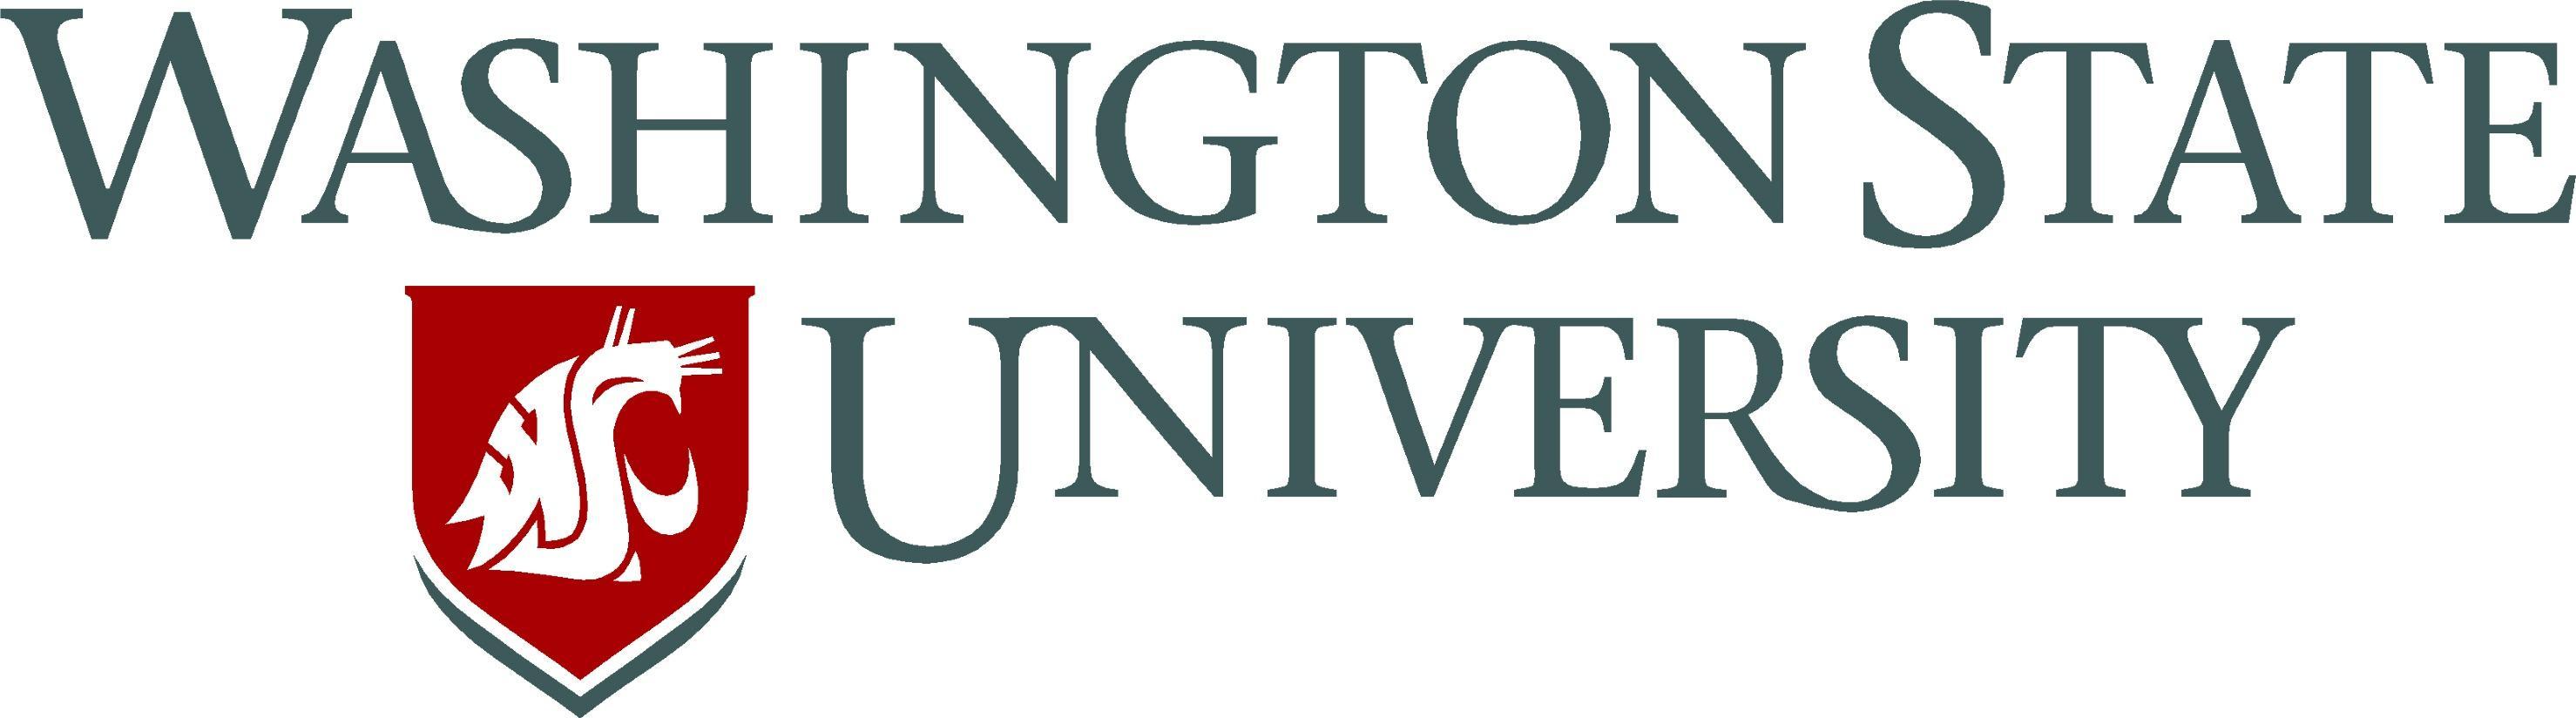 alt - США, Washington State University, Бакалавриат,Магистратура, 1